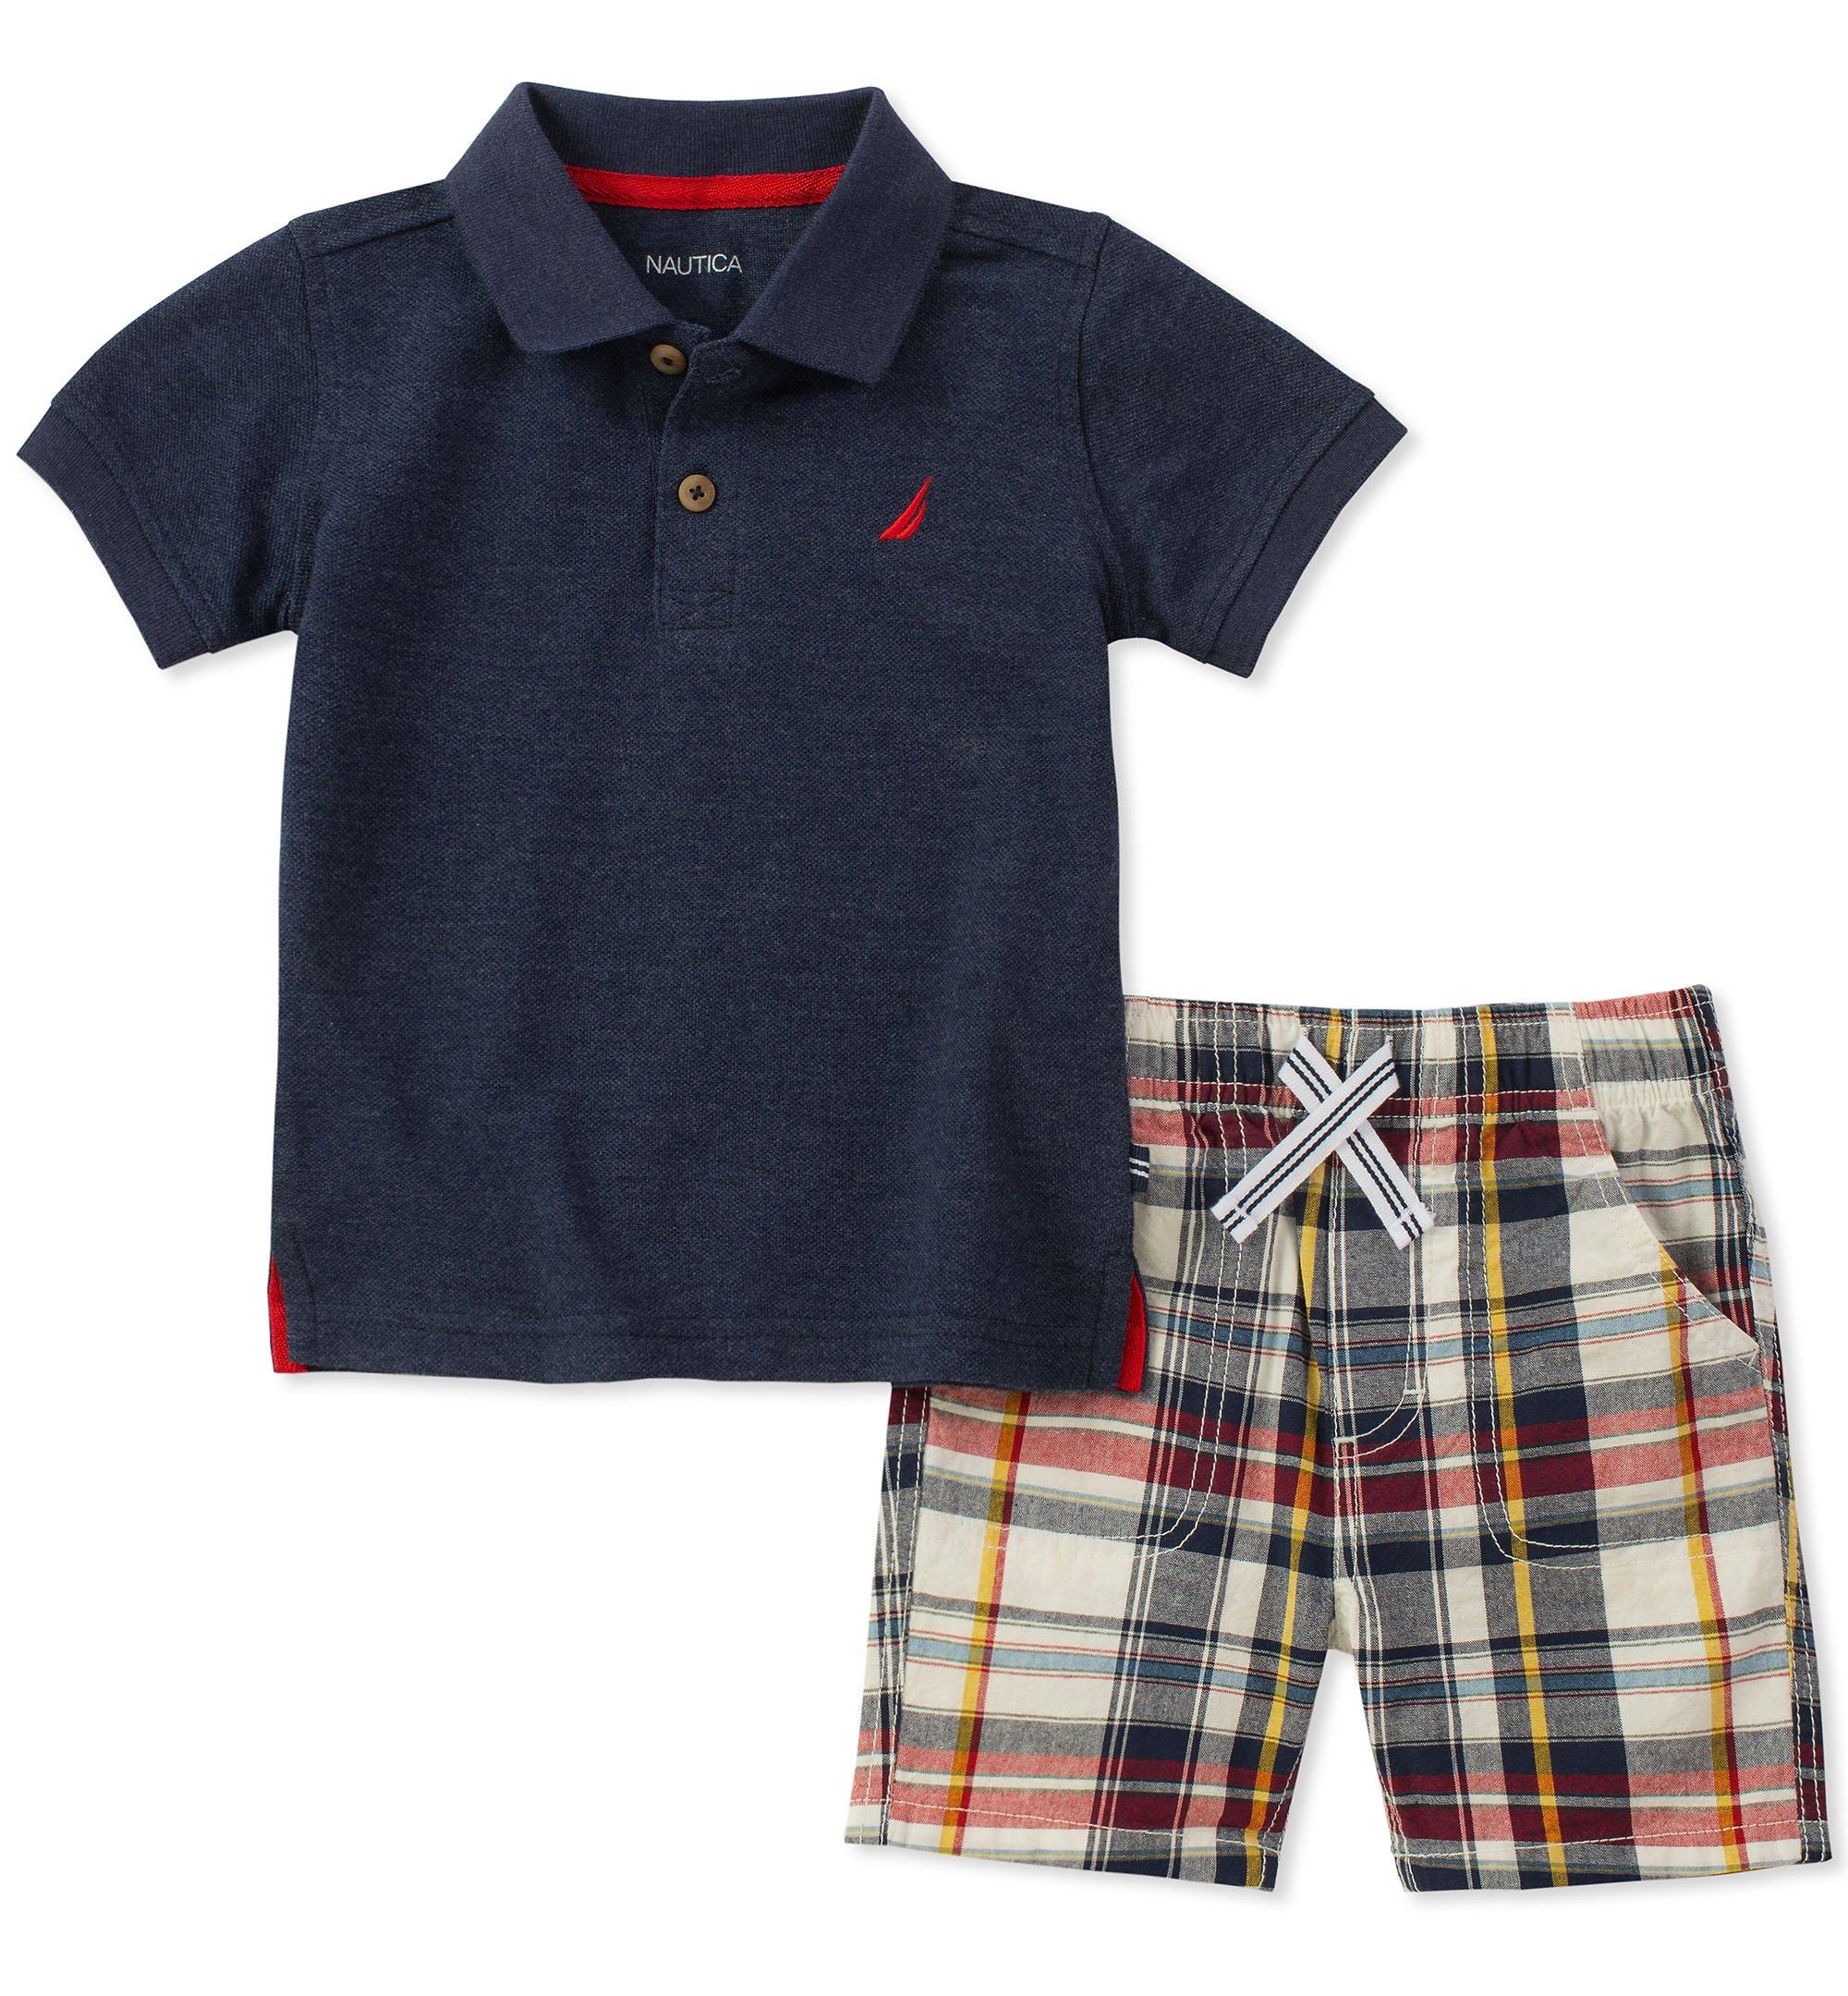 Nautica Boys' Toddler Polo with Shorts, Navy, 2T